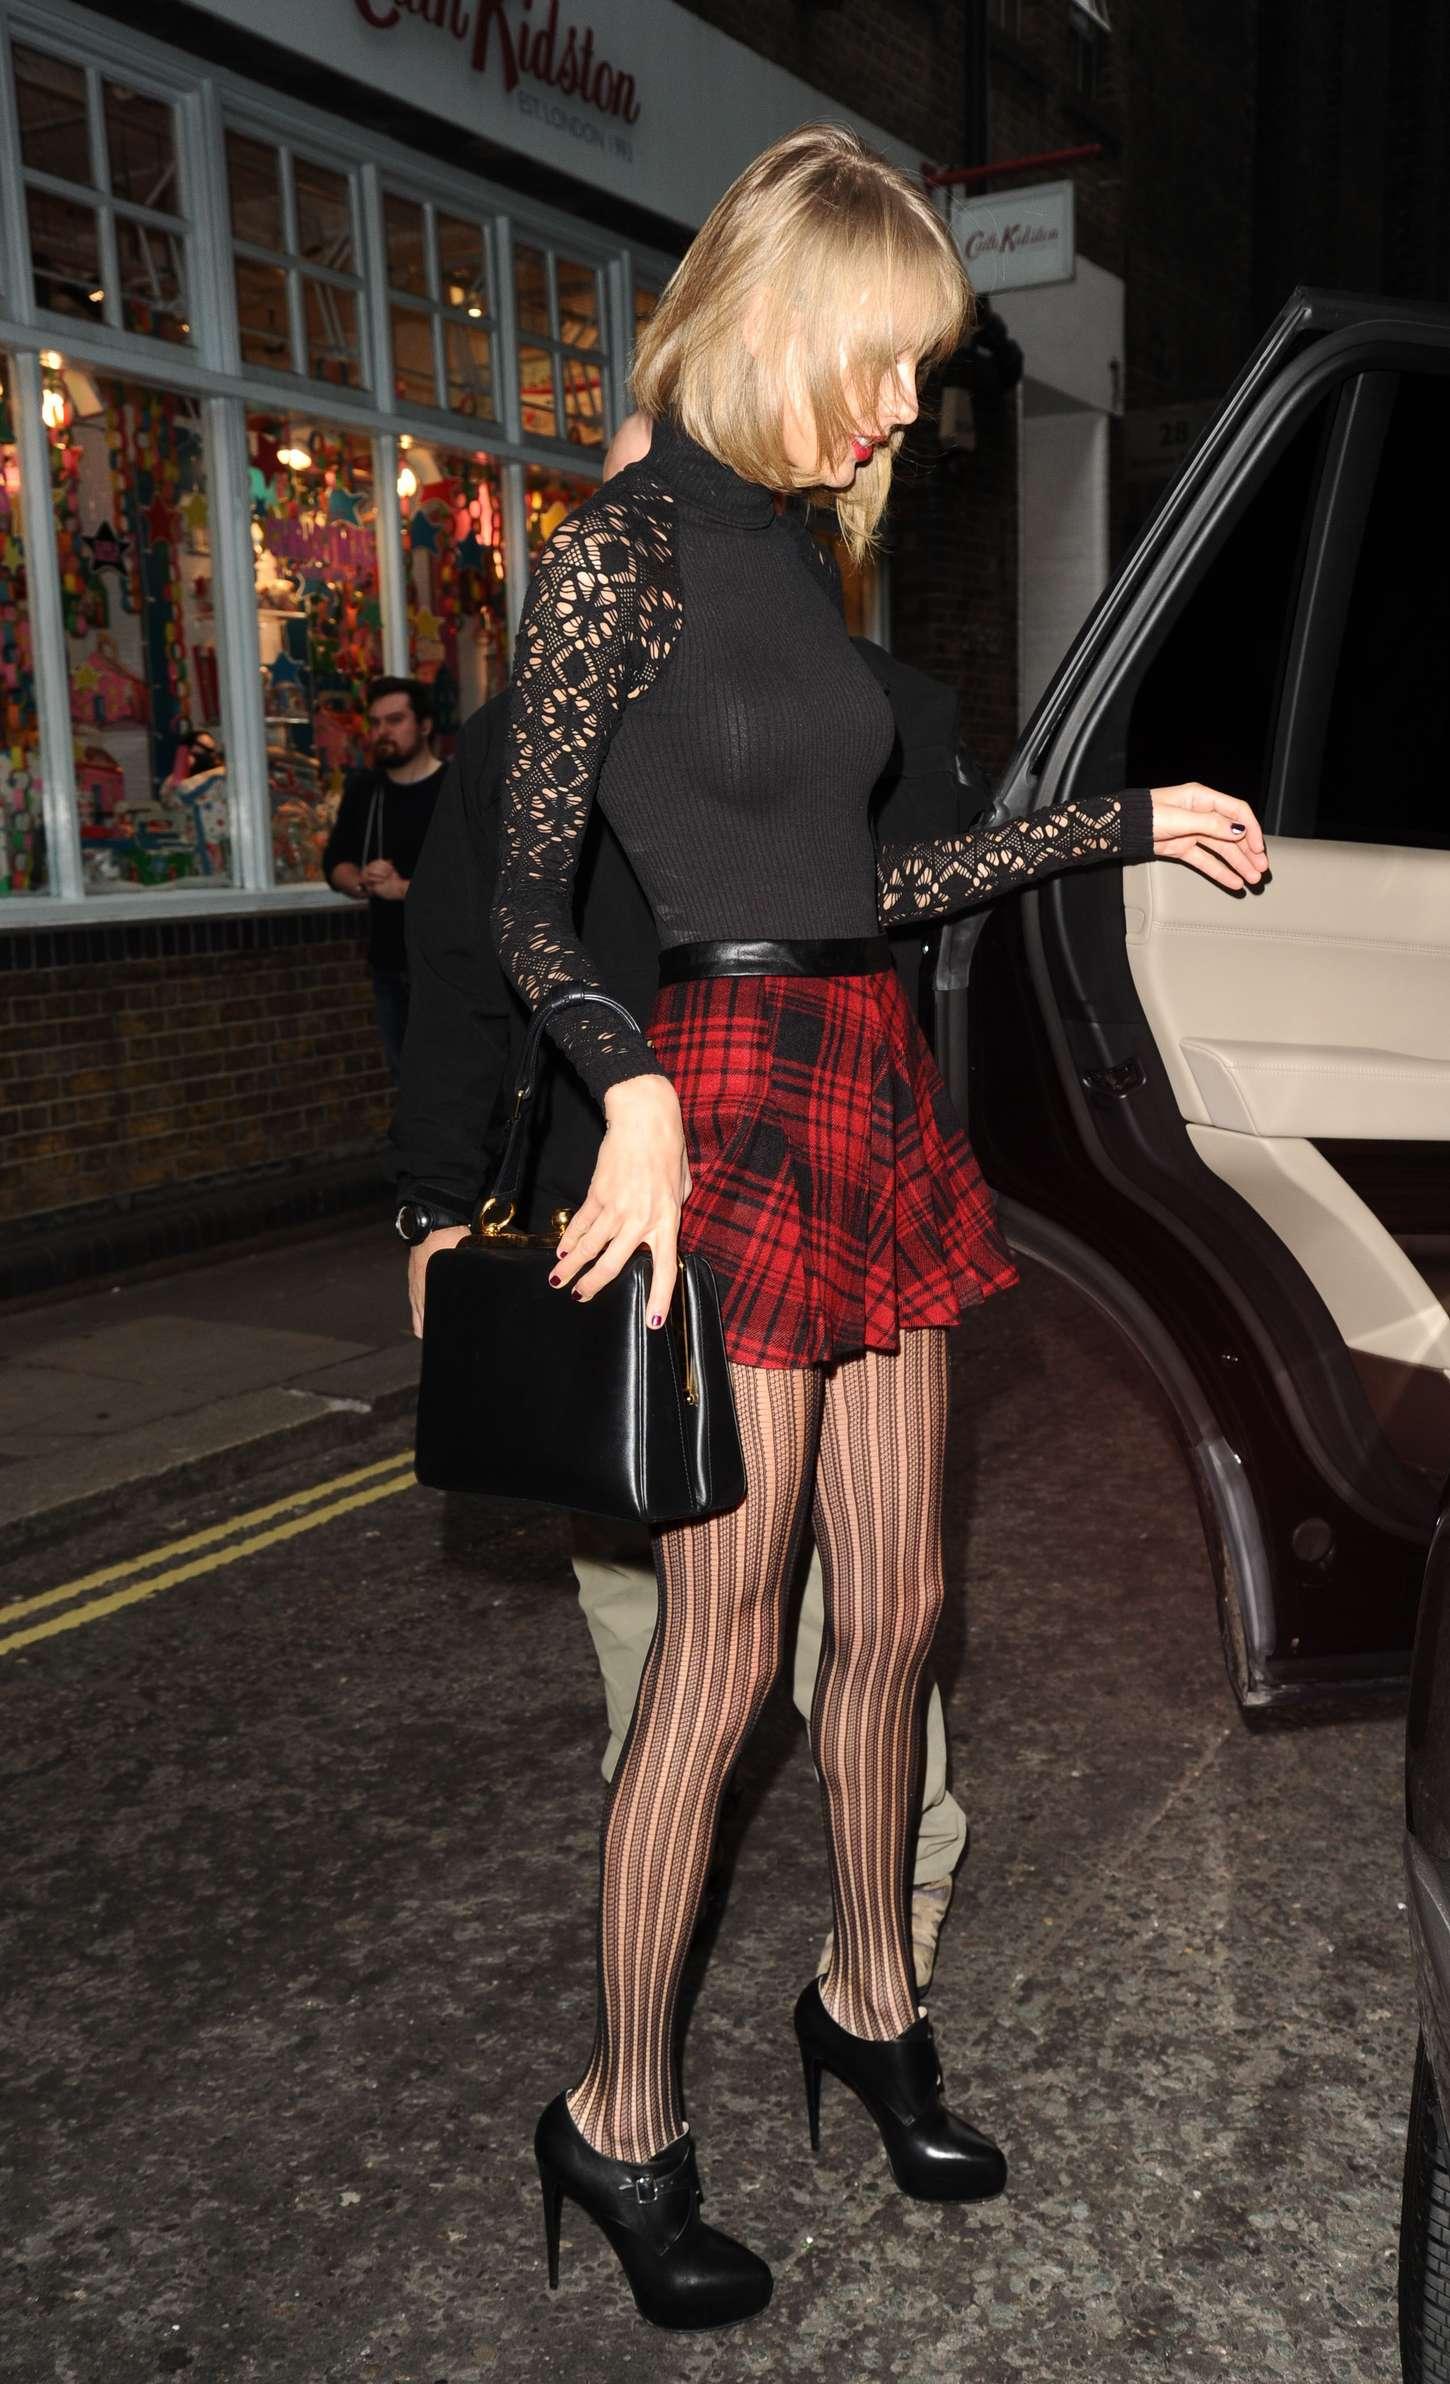 Taylor Swift 2014 : Taylor Swift in Mini Skirt at Cath Kidston -07